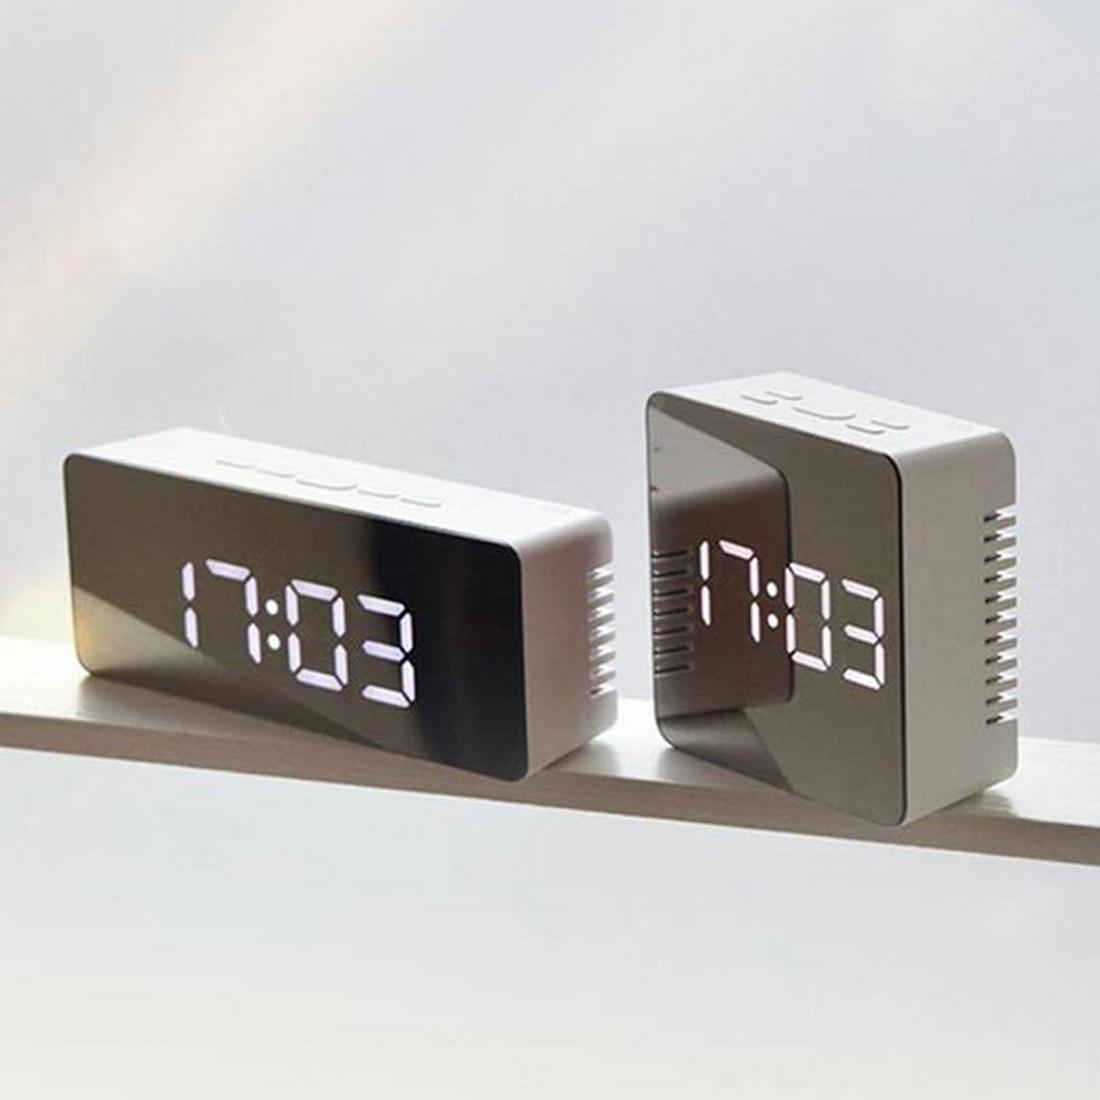 140mm LED Mirror Alarm Clock Digital Clock Snooze Display Time Night Led Light Table Desktop Alarm Clock Despertador title=